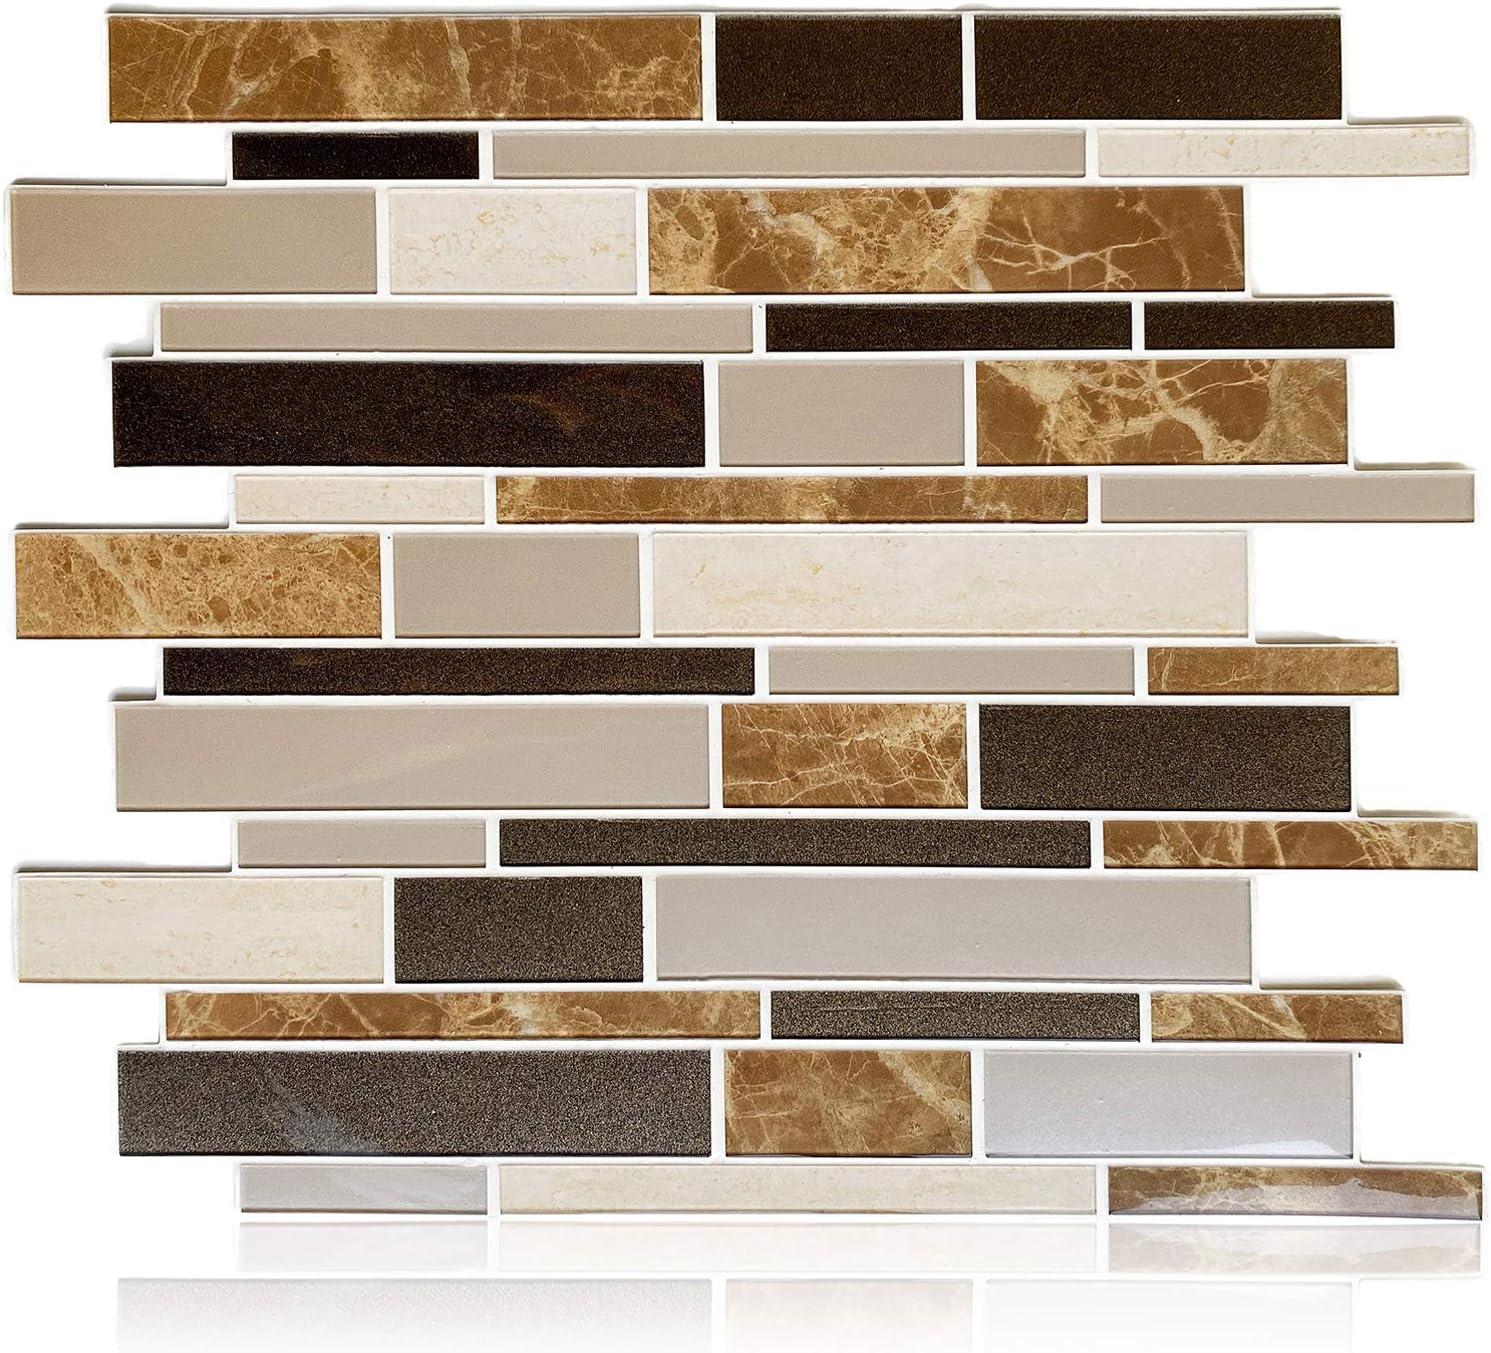 - Amazon.com: HomeyMosaic Peel And Stick Backsplash Tile 3D Wall